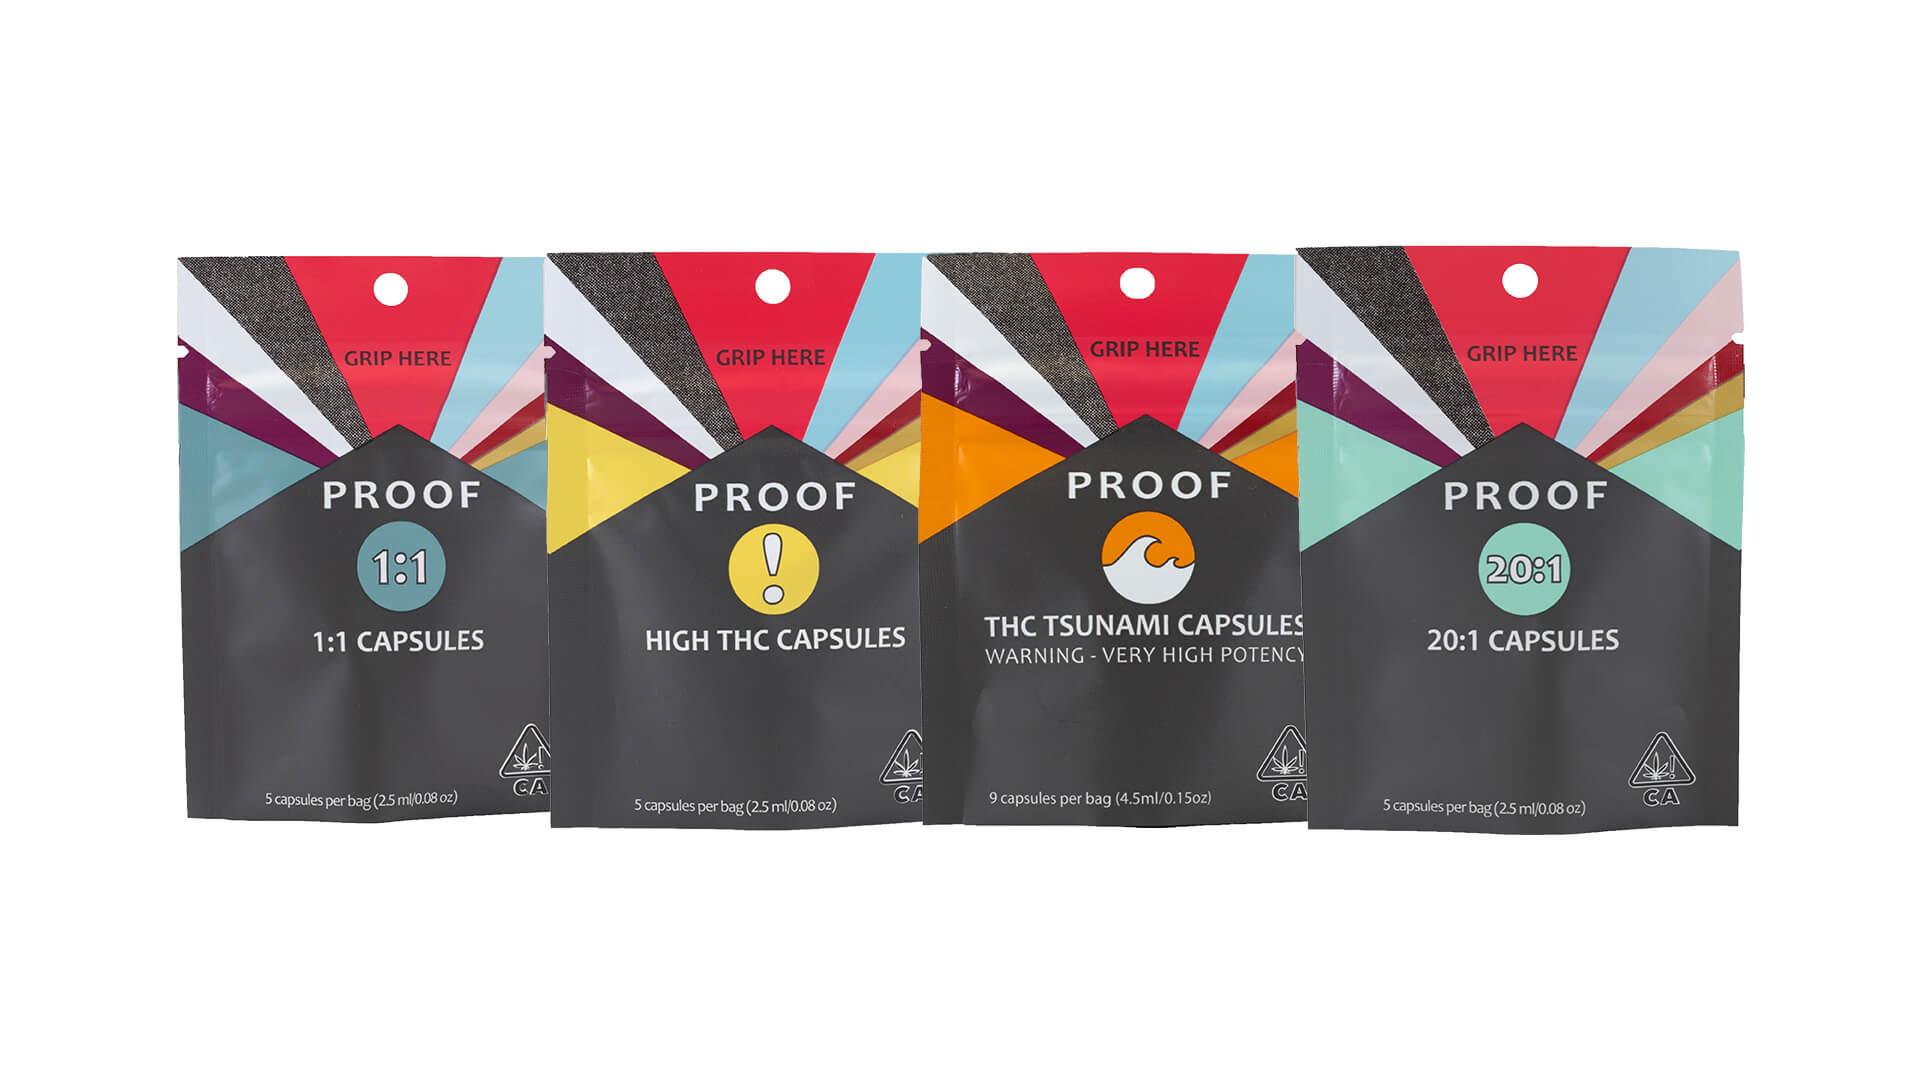 Proof capsules bags